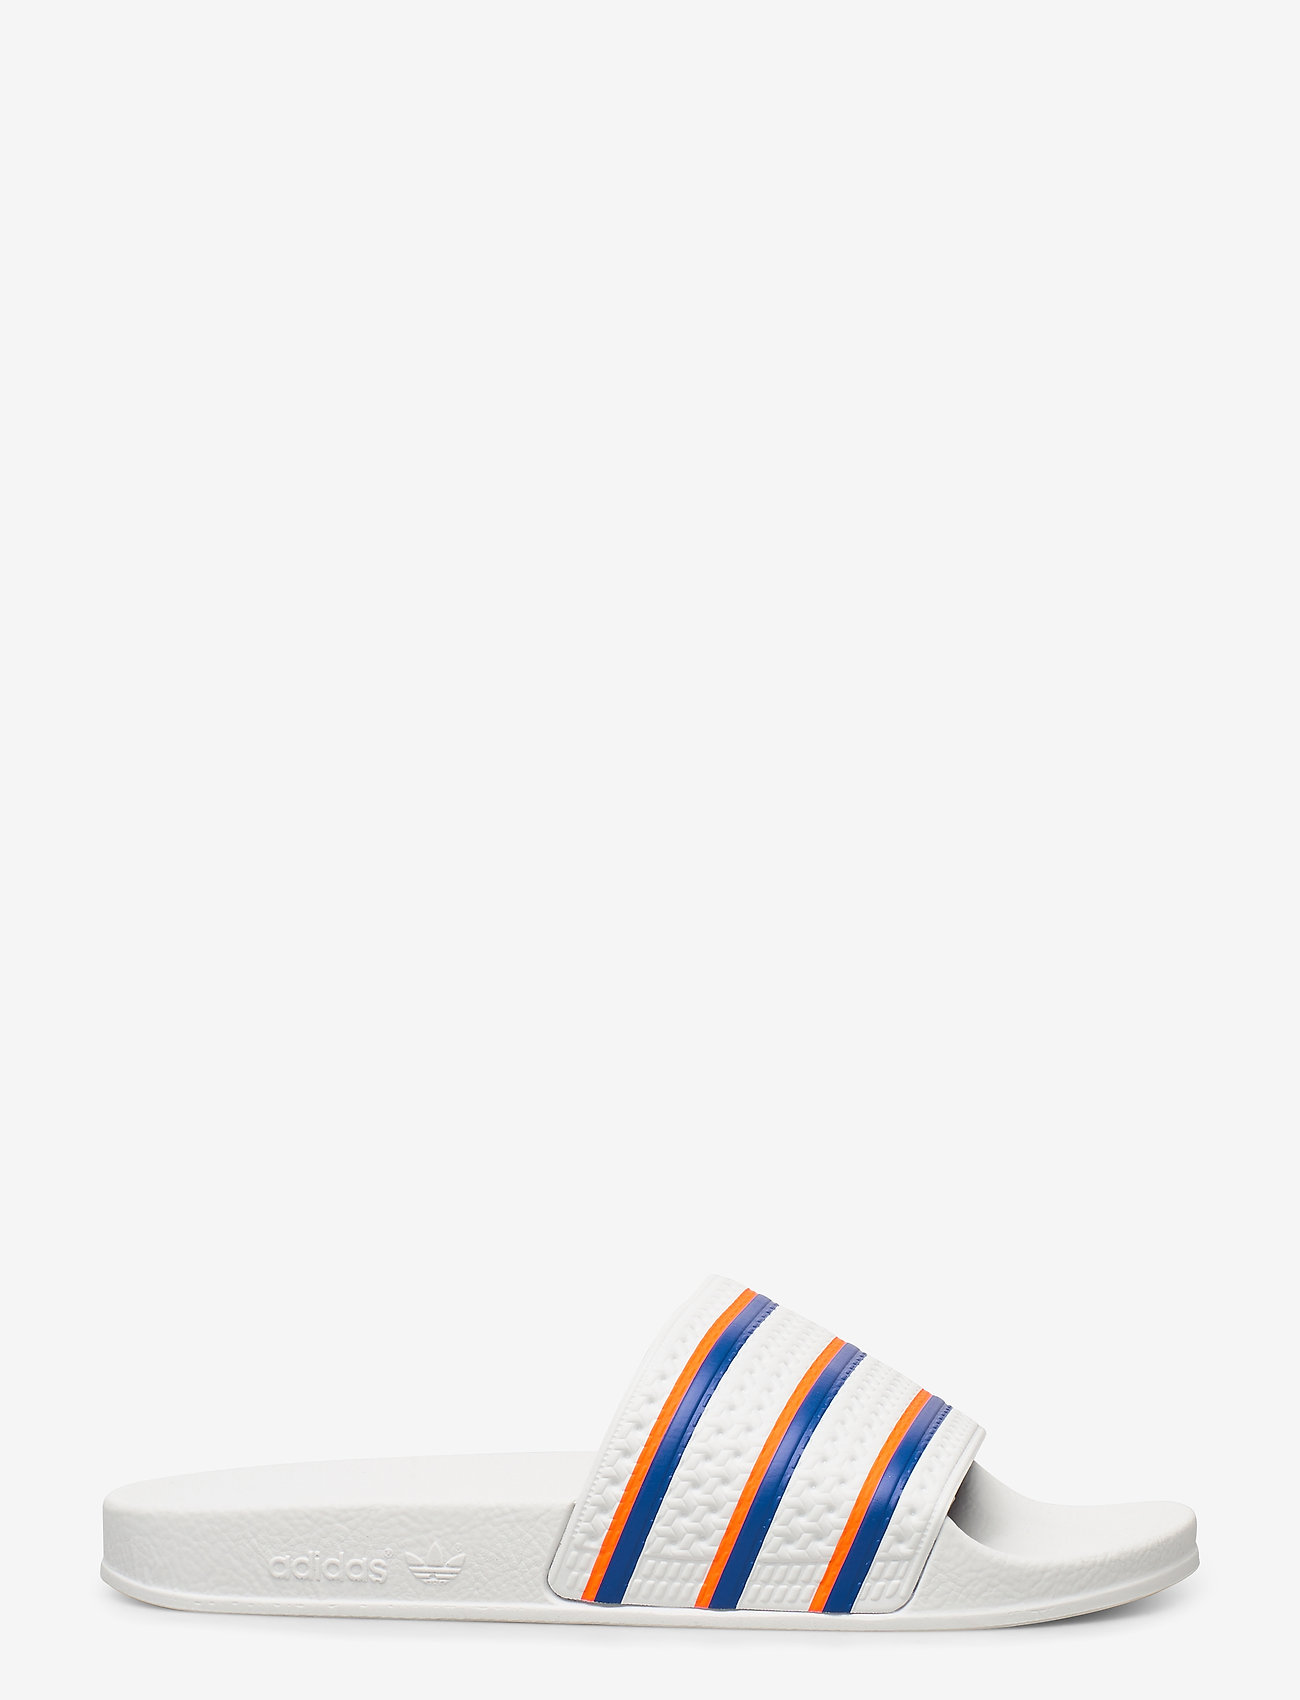 adidas Originals - ADILETTE - sneakers - ftwwht/blue/solred - 1